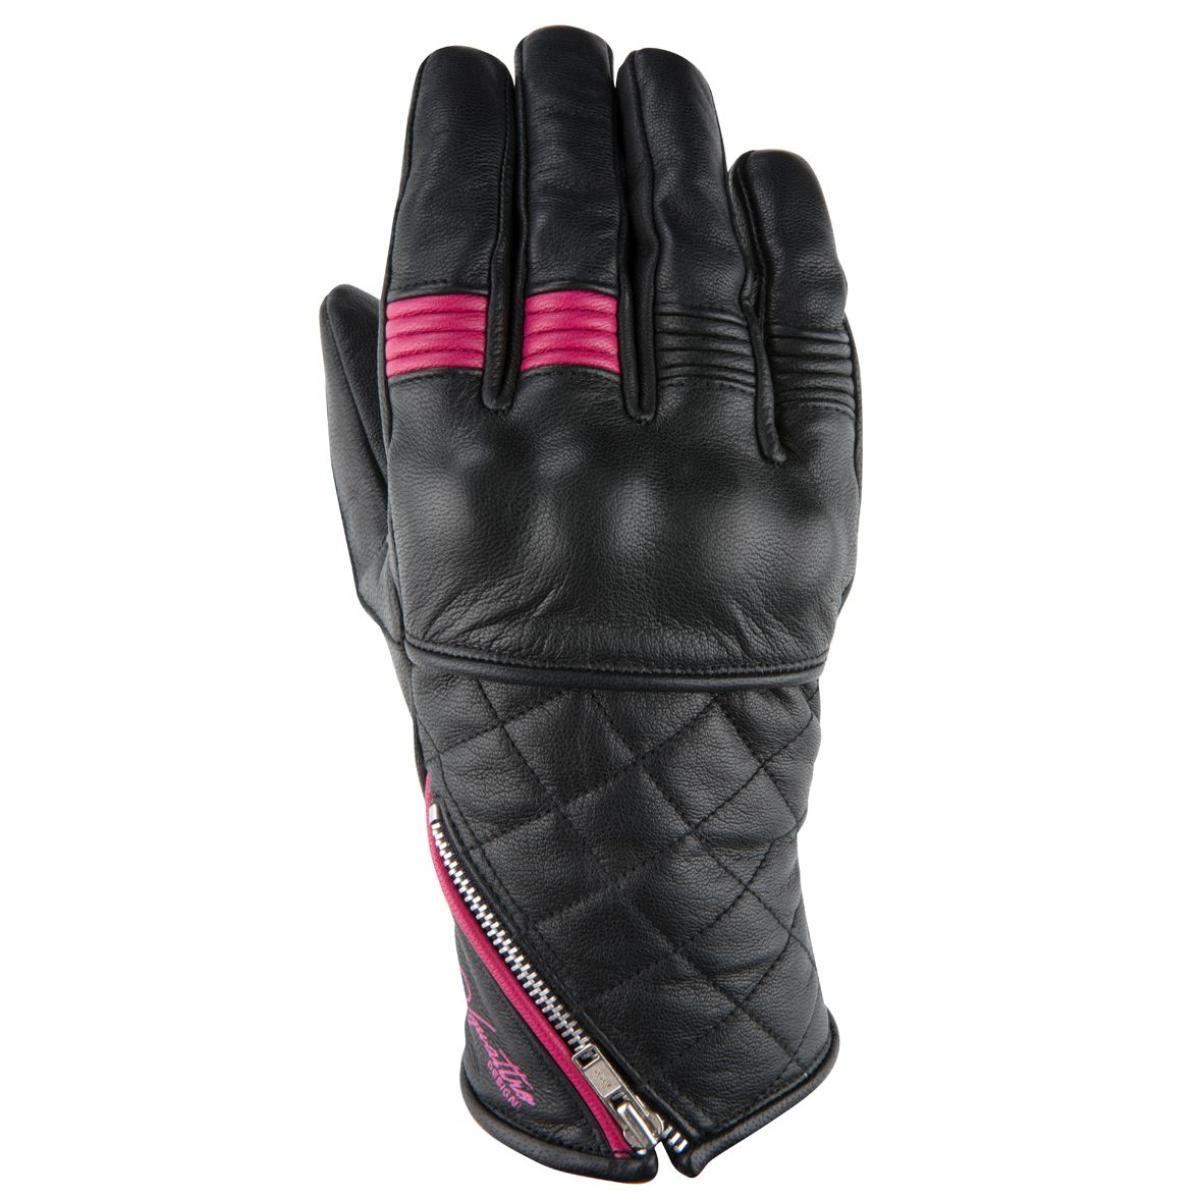 gants moto ete femme v 39 quattro murano noir rose. Black Bedroom Furniture Sets. Home Design Ideas